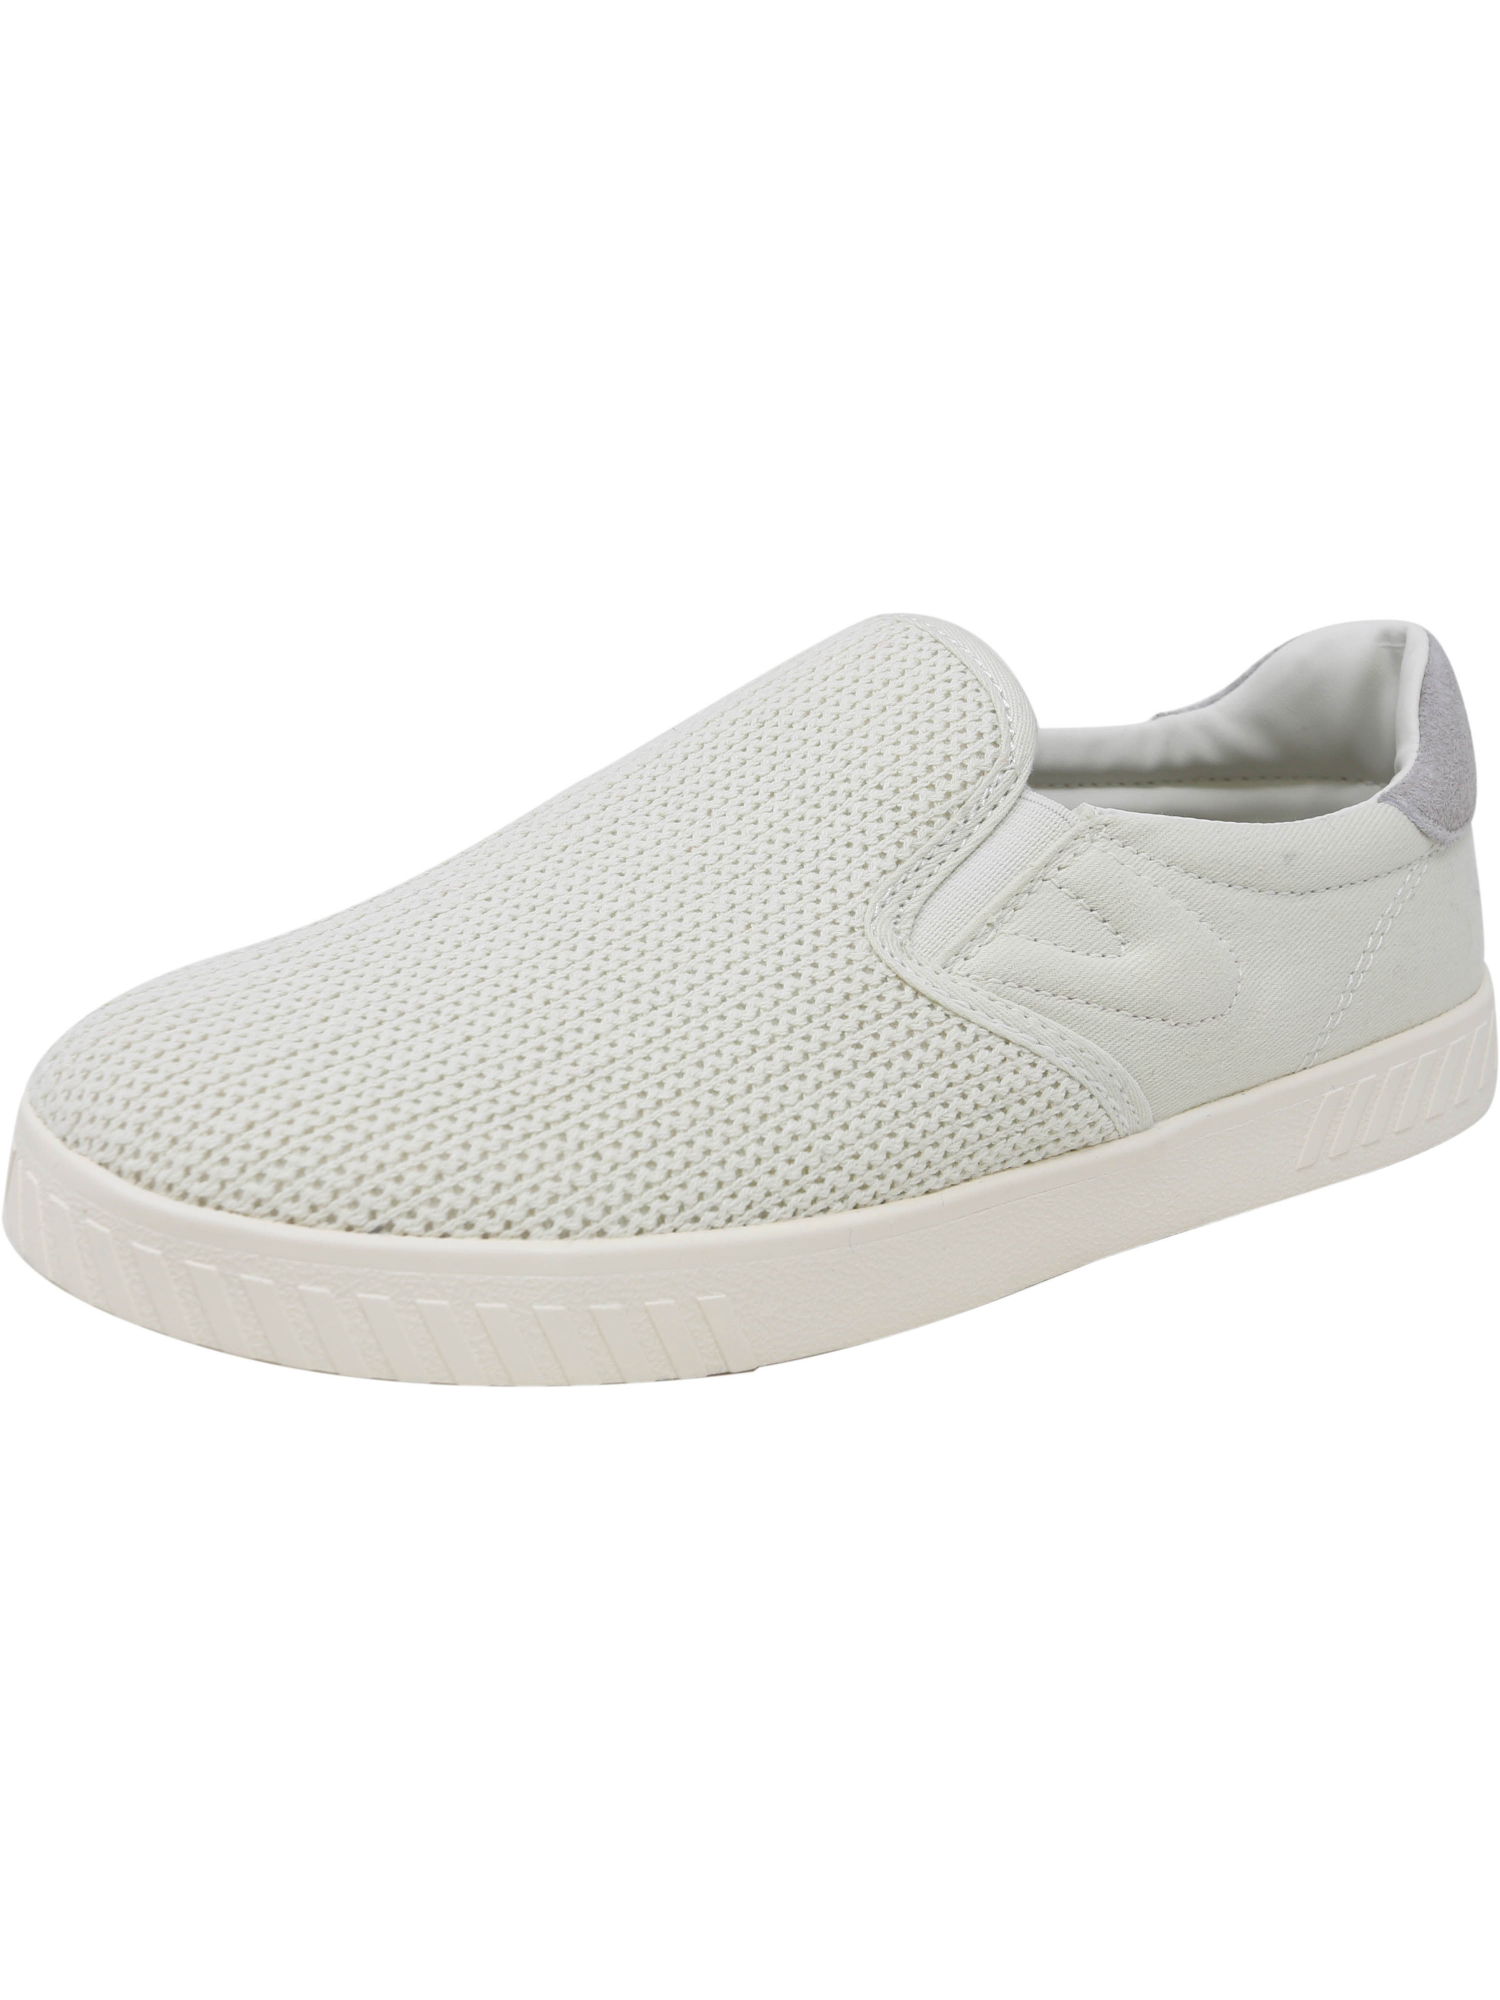 Tretorn Women/'s Cruz Fabric Ankle-High Slip-On Shoes